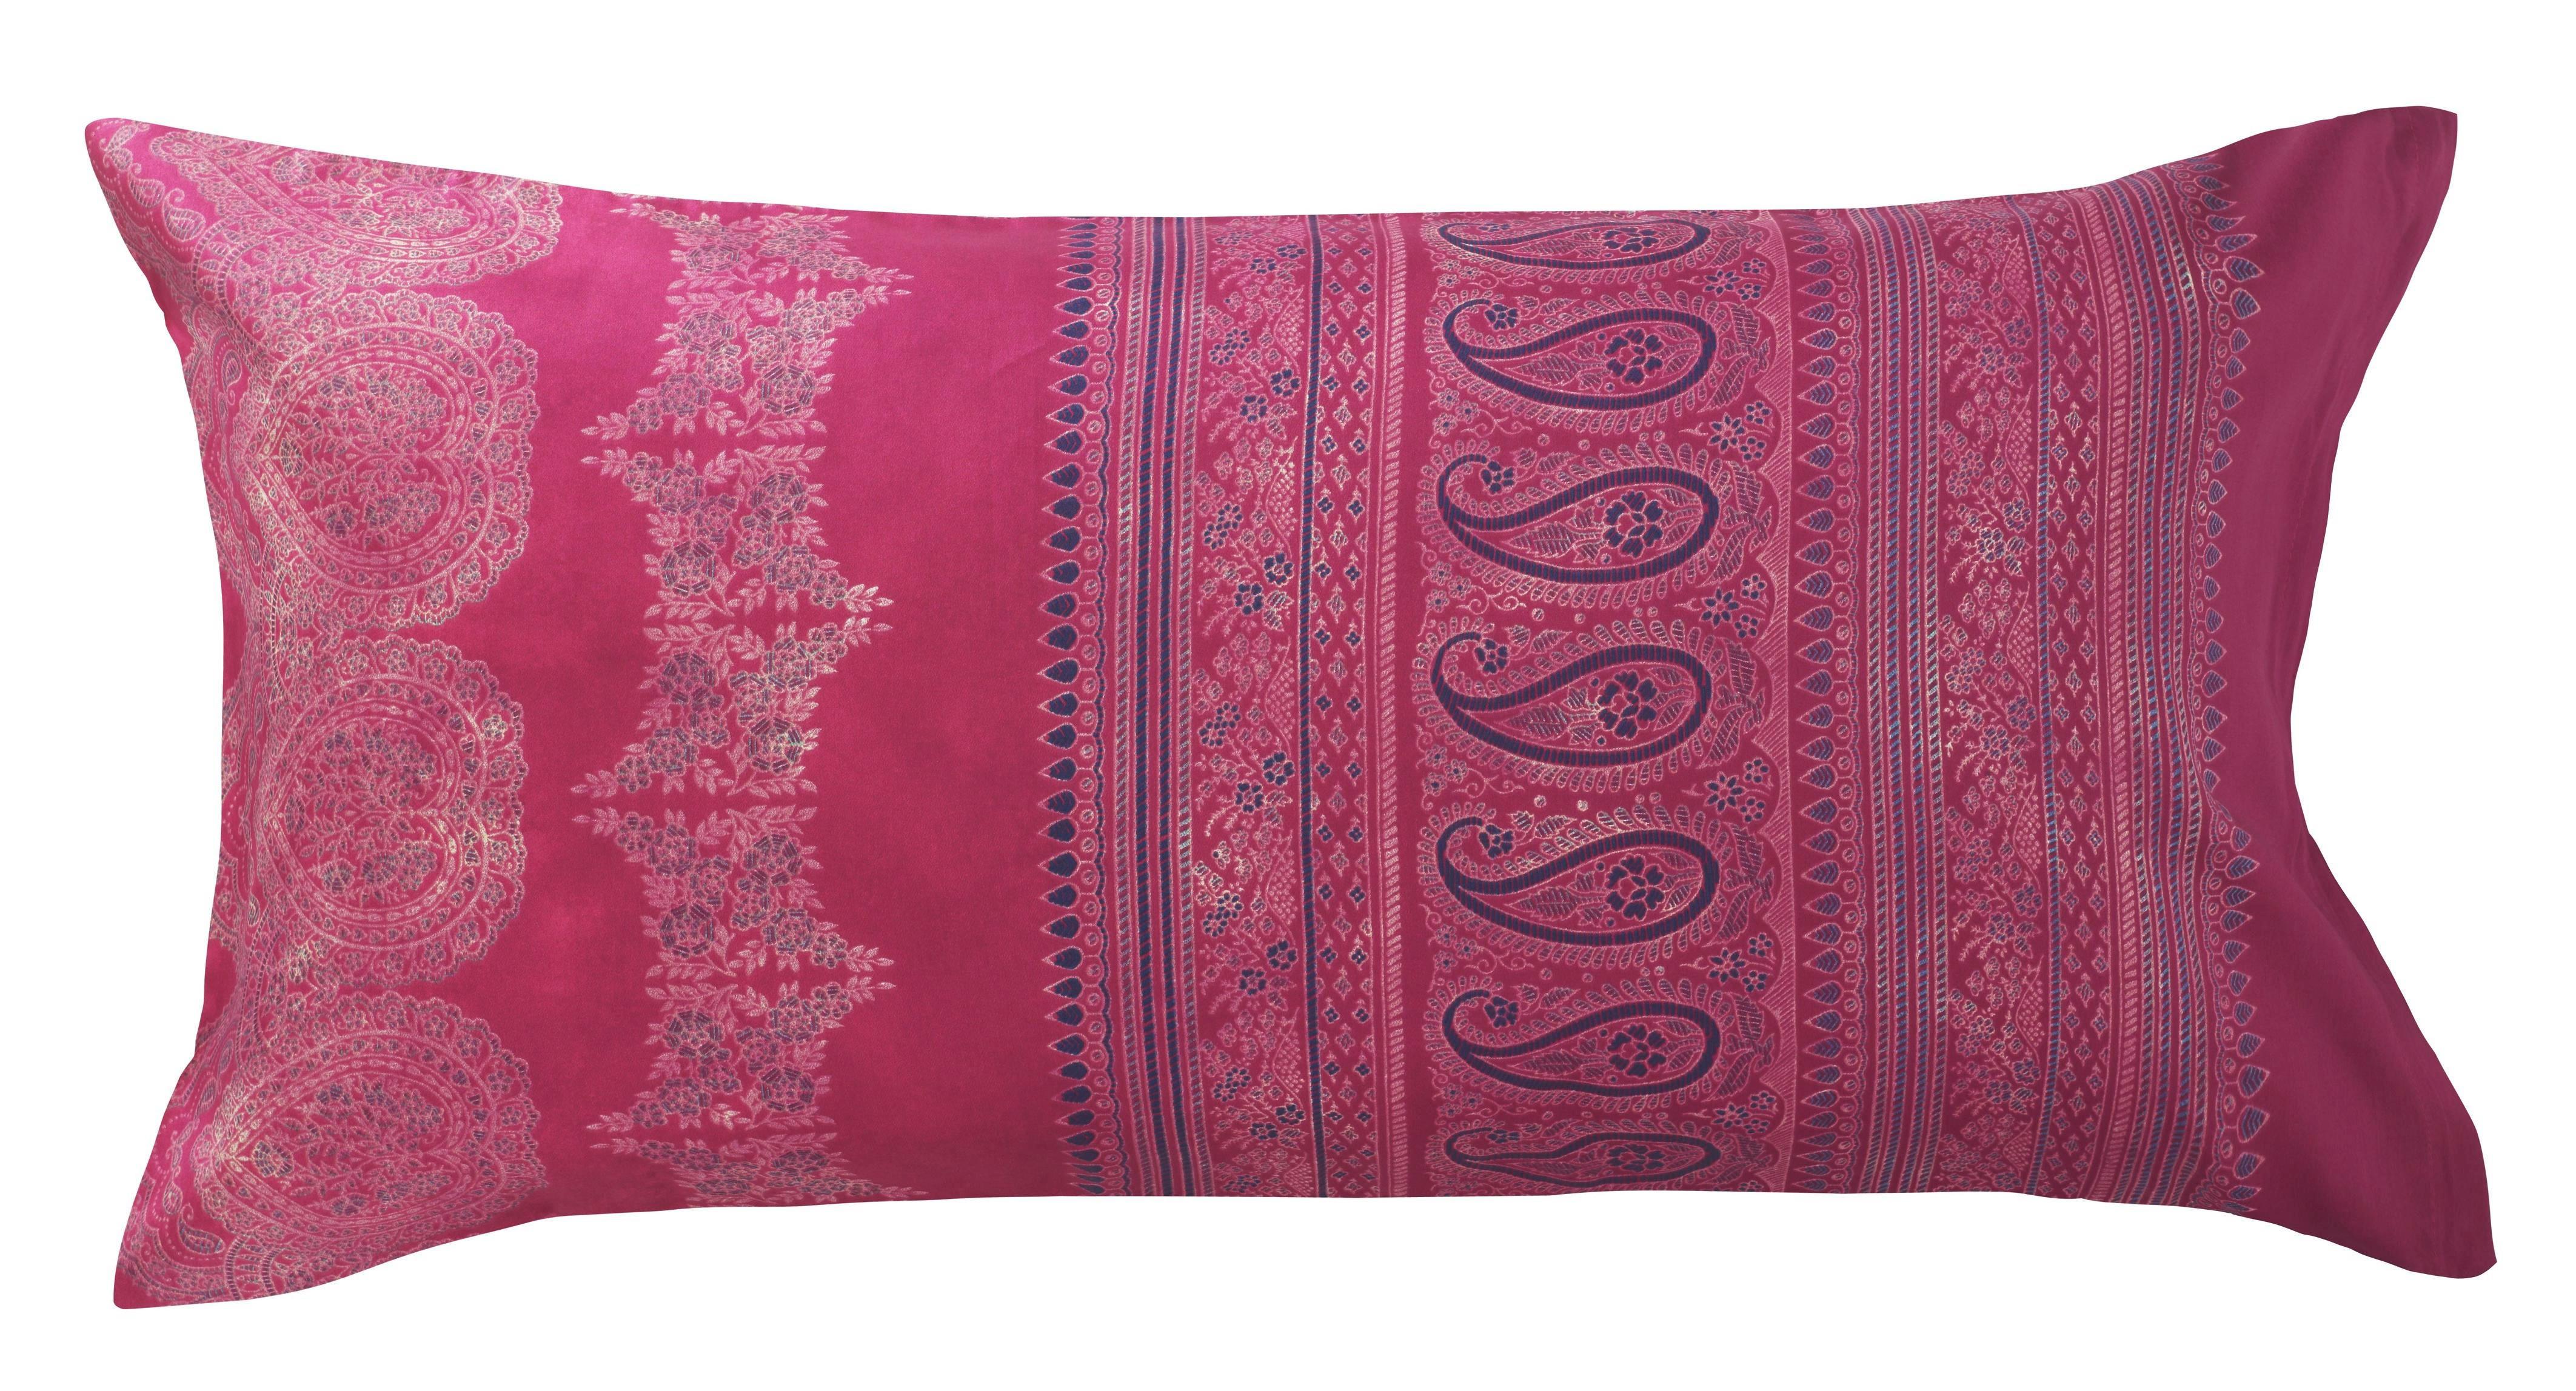 KISSENHÜLLE Magenta - Magenta, LIFESTYLE, Textil (40/80cm) - BASSETTI